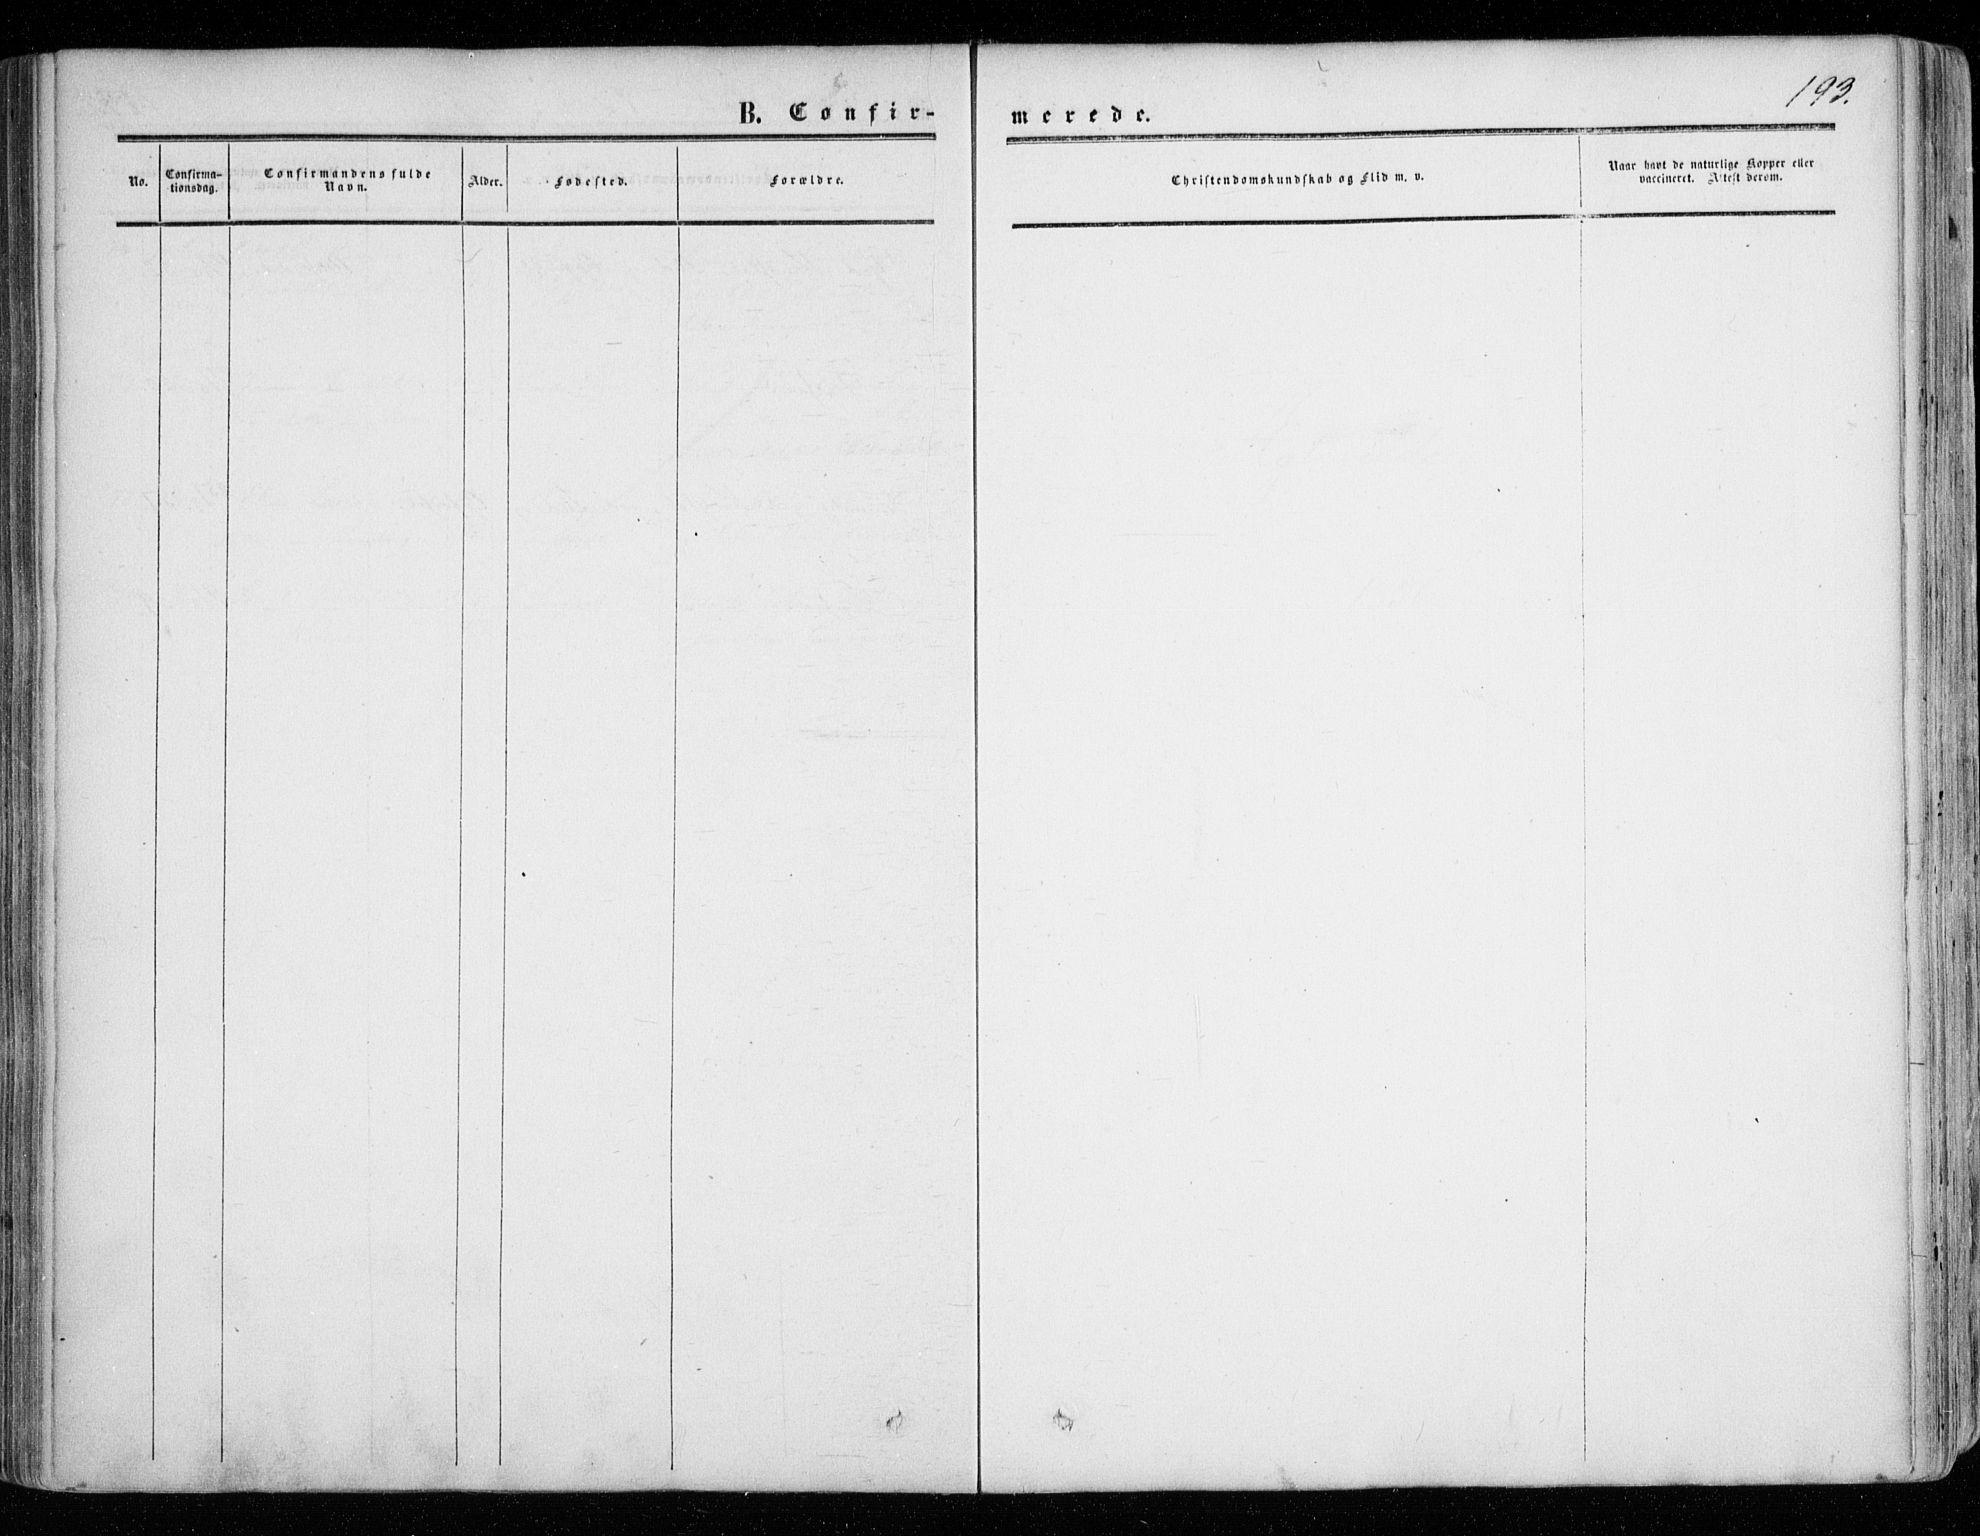 SATØ, Tranøy sokneprestkontor, I/Ia/Iaa/L0007kirke: Ministerialbok nr. 7, 1856-1866, s. 193